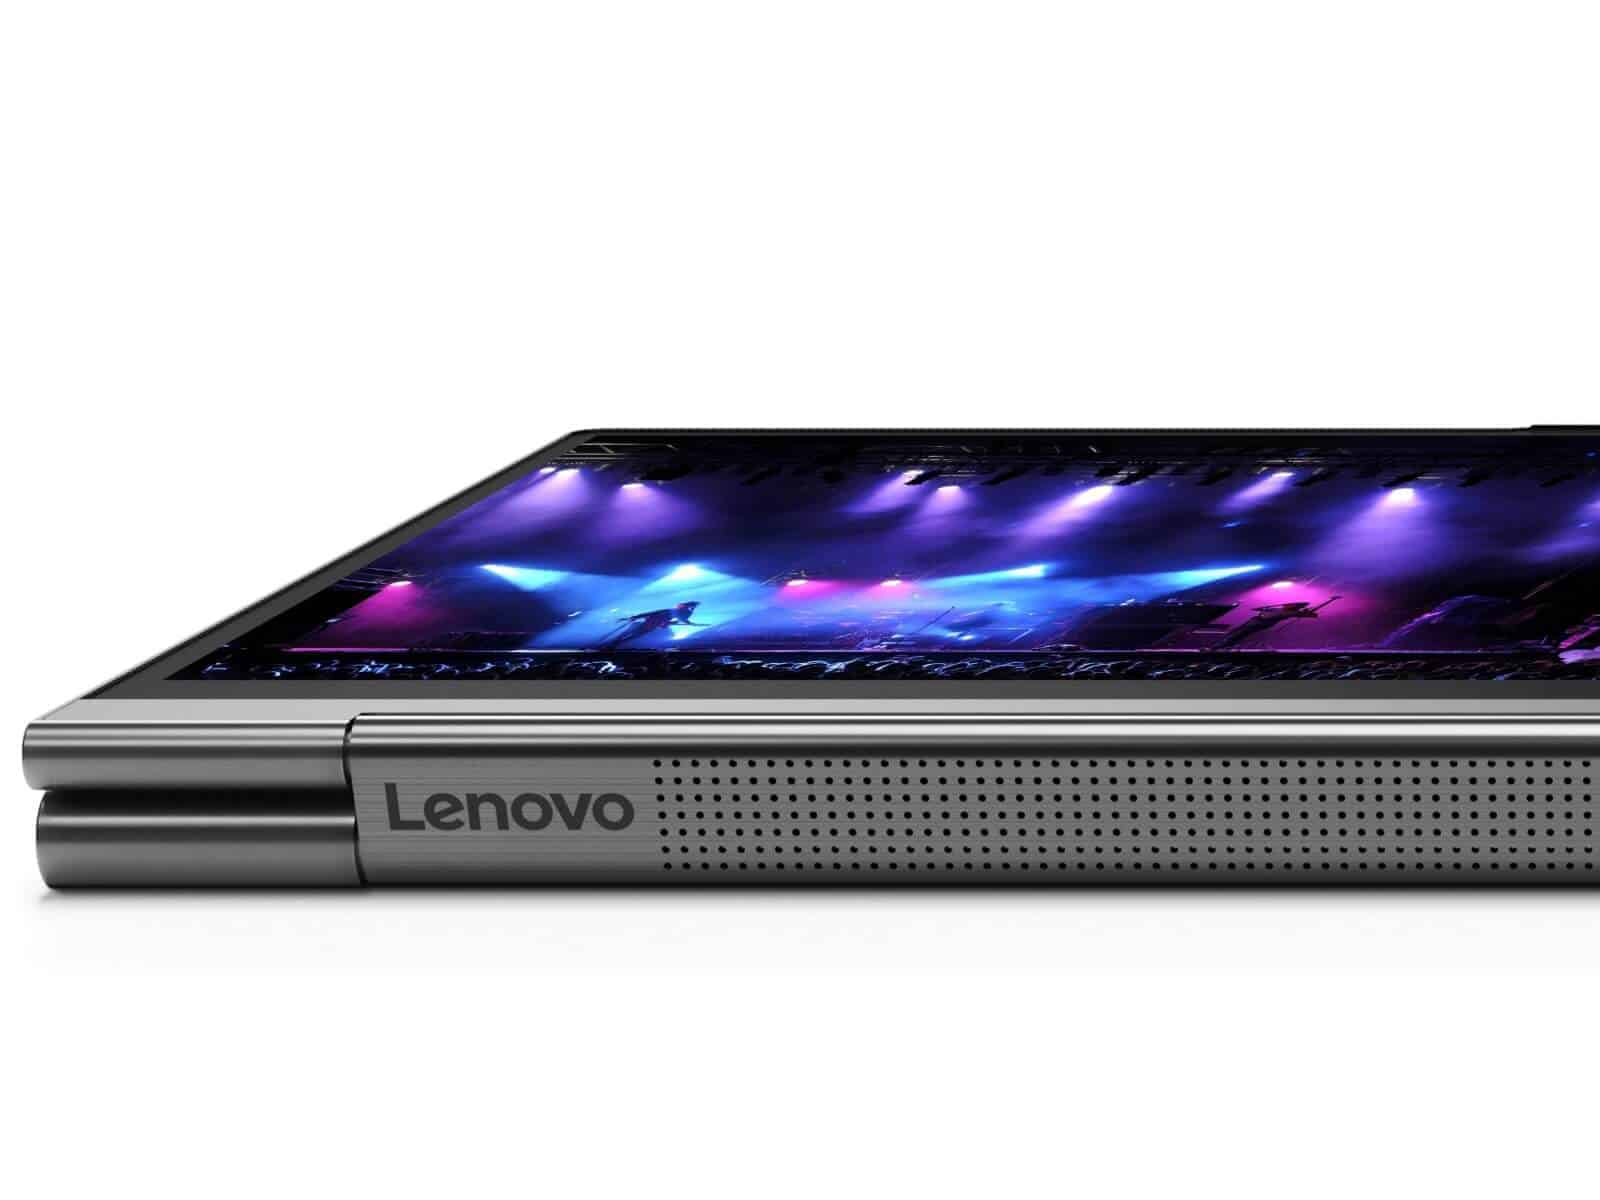 Lenovo Yoga C940 14iil Fhd 14 Laptop I7 16gb 1000gb Ssd Win 10 Home 81q900aksa Tech Co Za